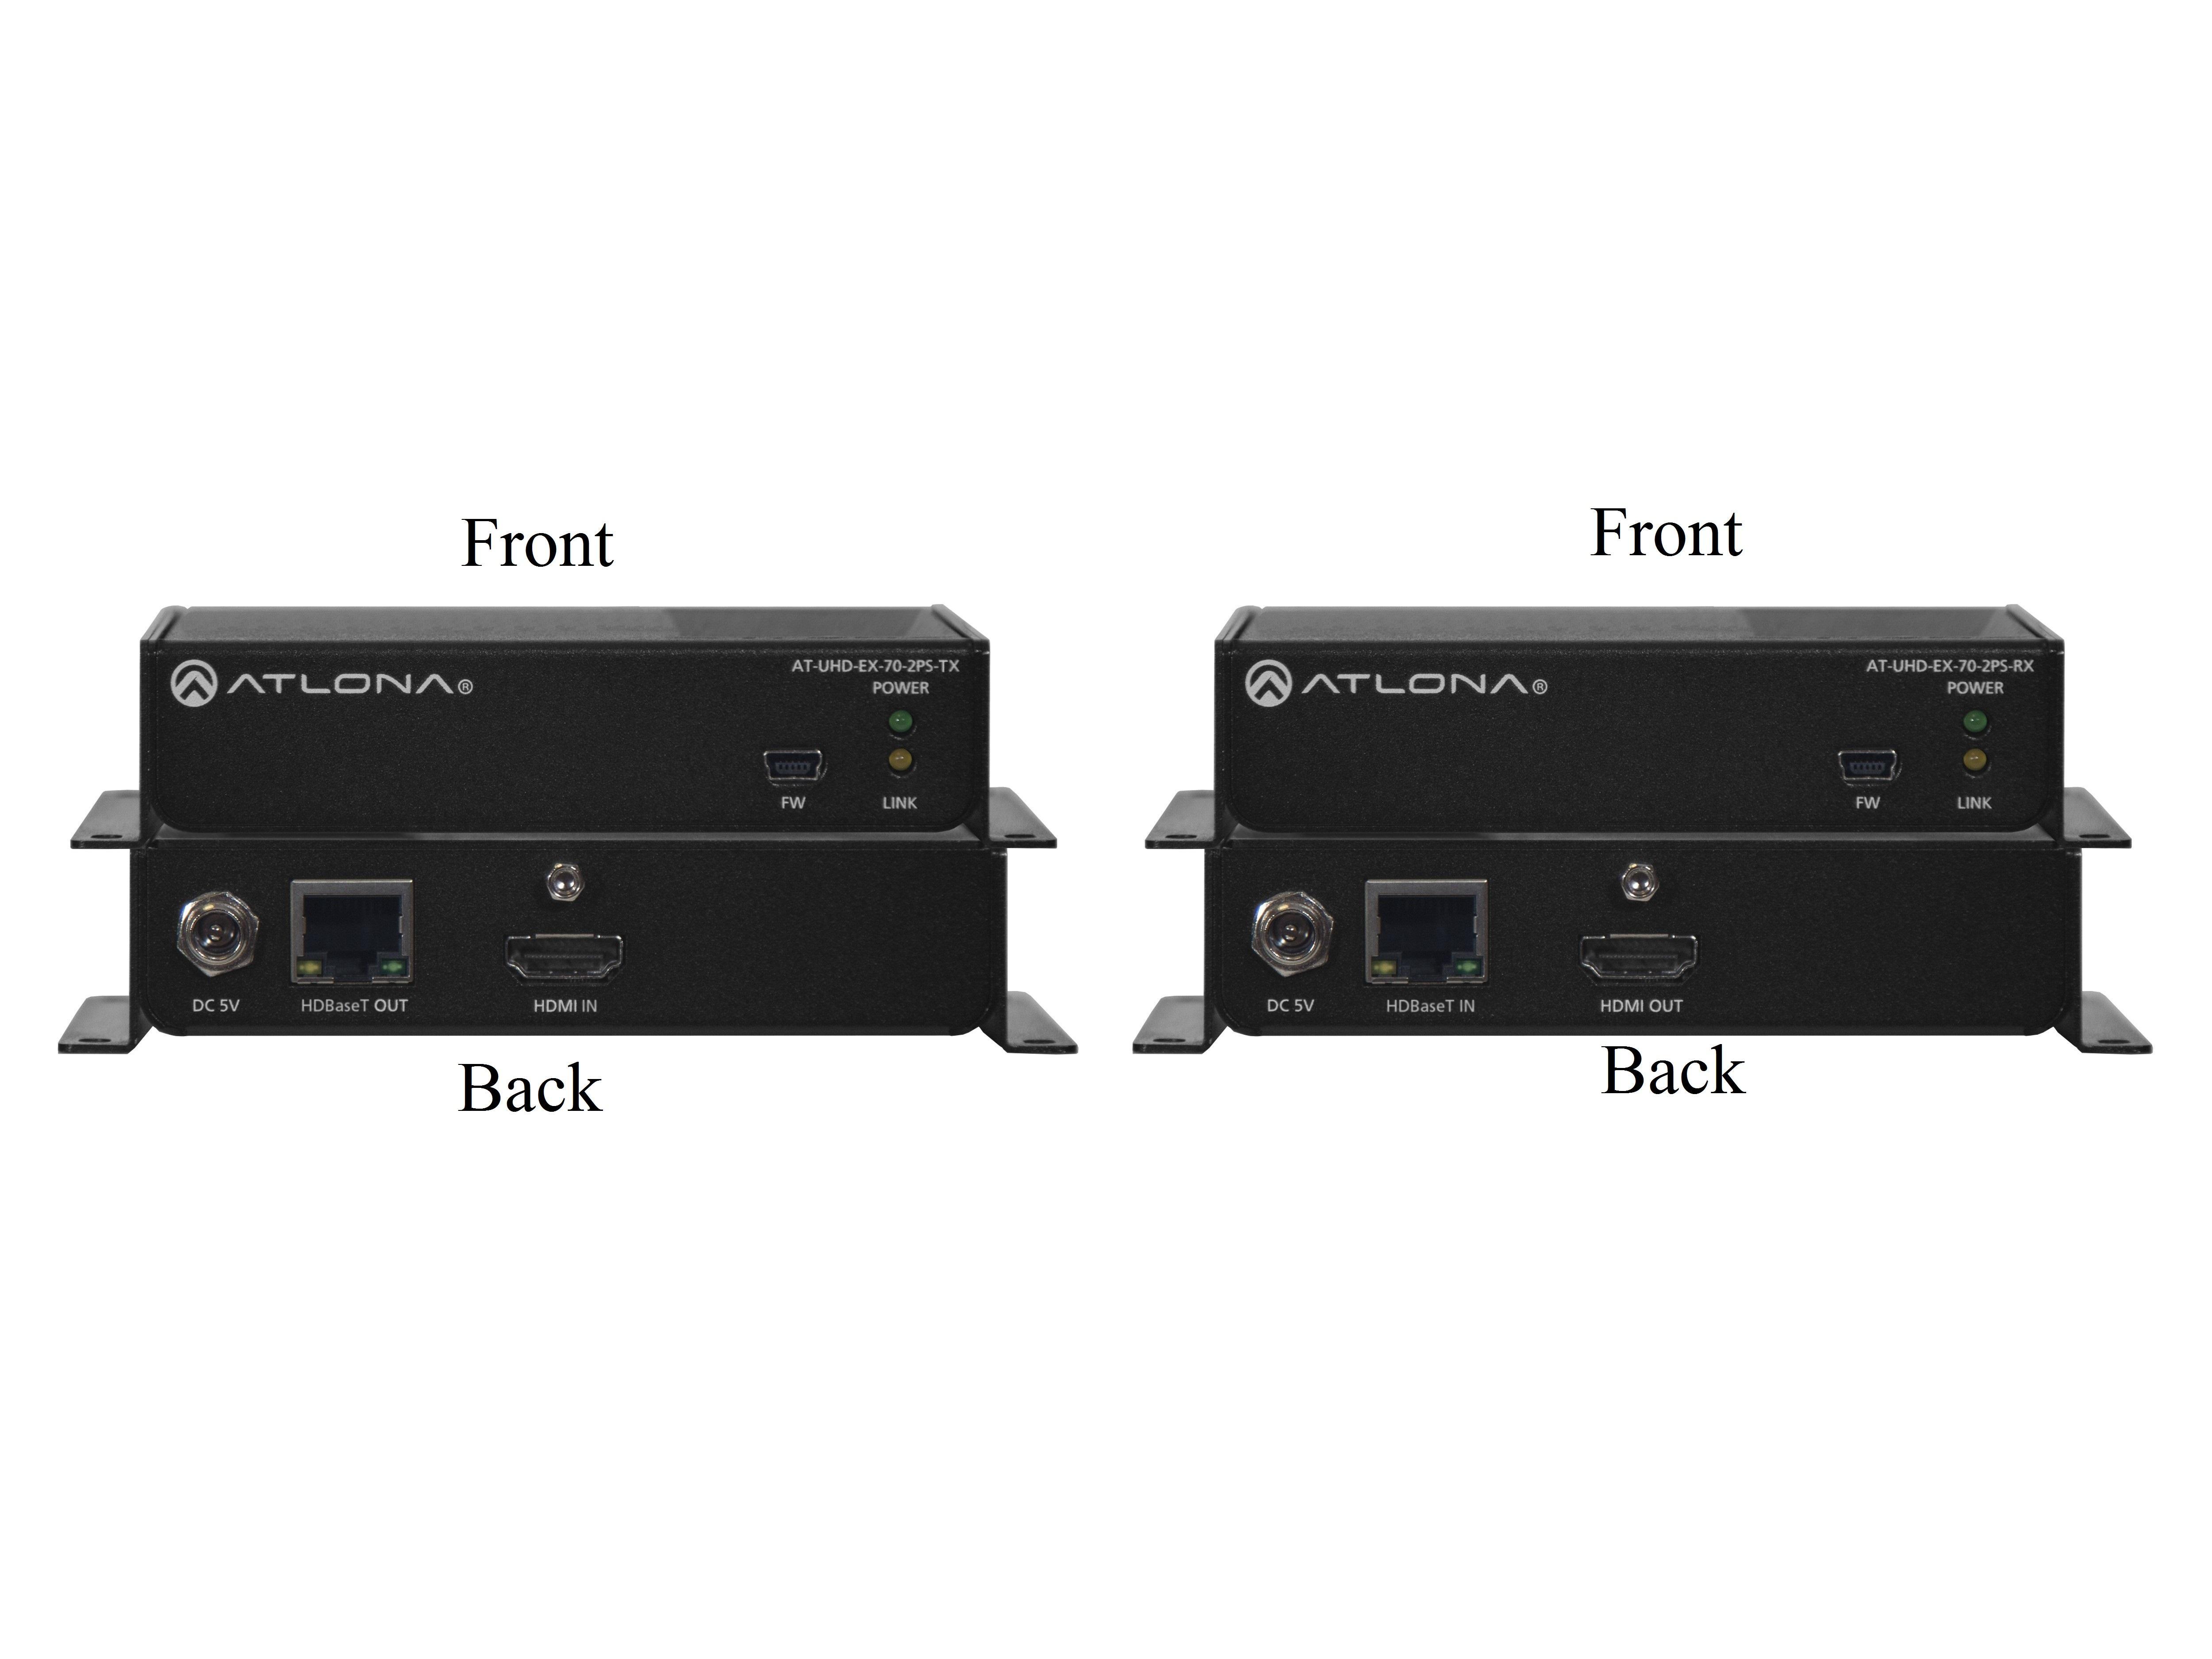 Atlona AT-UHD-EX-70-2PS 4K/UHD HDMI Over HDBaseT Extender(Transmitter/Receiver) Kit